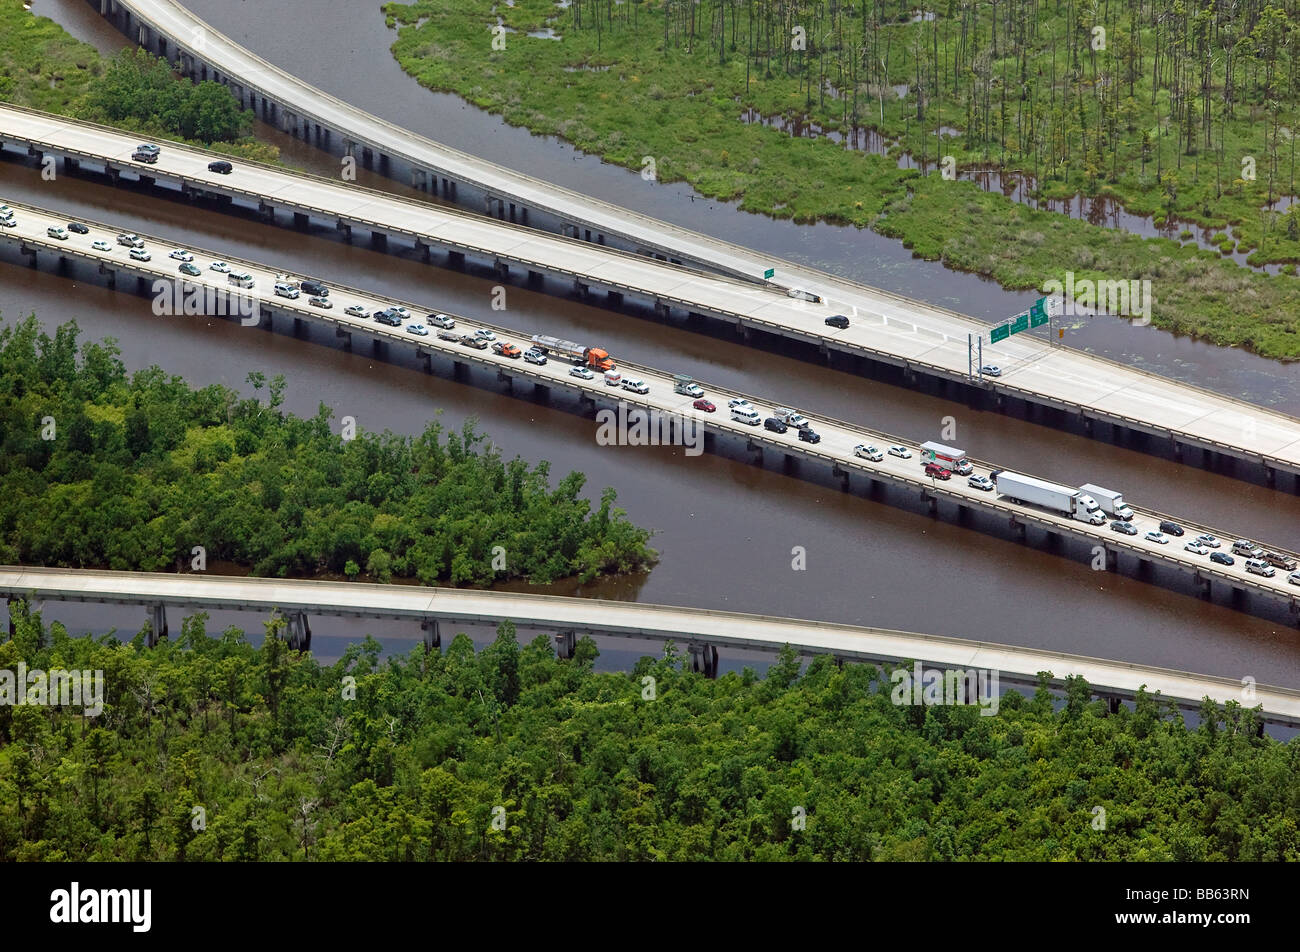 Luftaufnahme über dem stark befahrenen verlassen Großraum New Orleans Louisana am Interstate 10 Kreuzung Stockbild